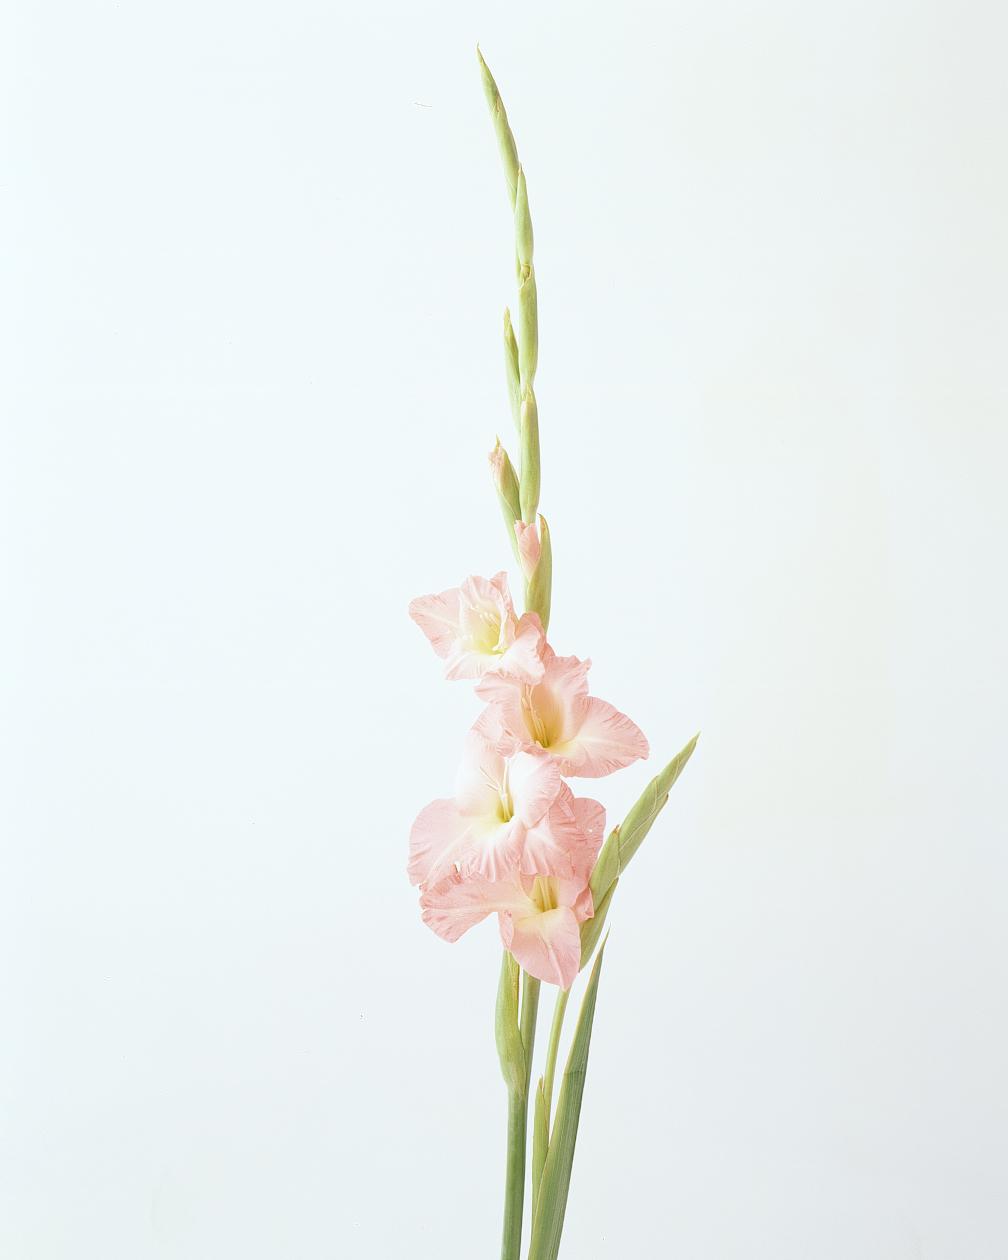 flower-glossary-gladiola-a98432-0415.jpg